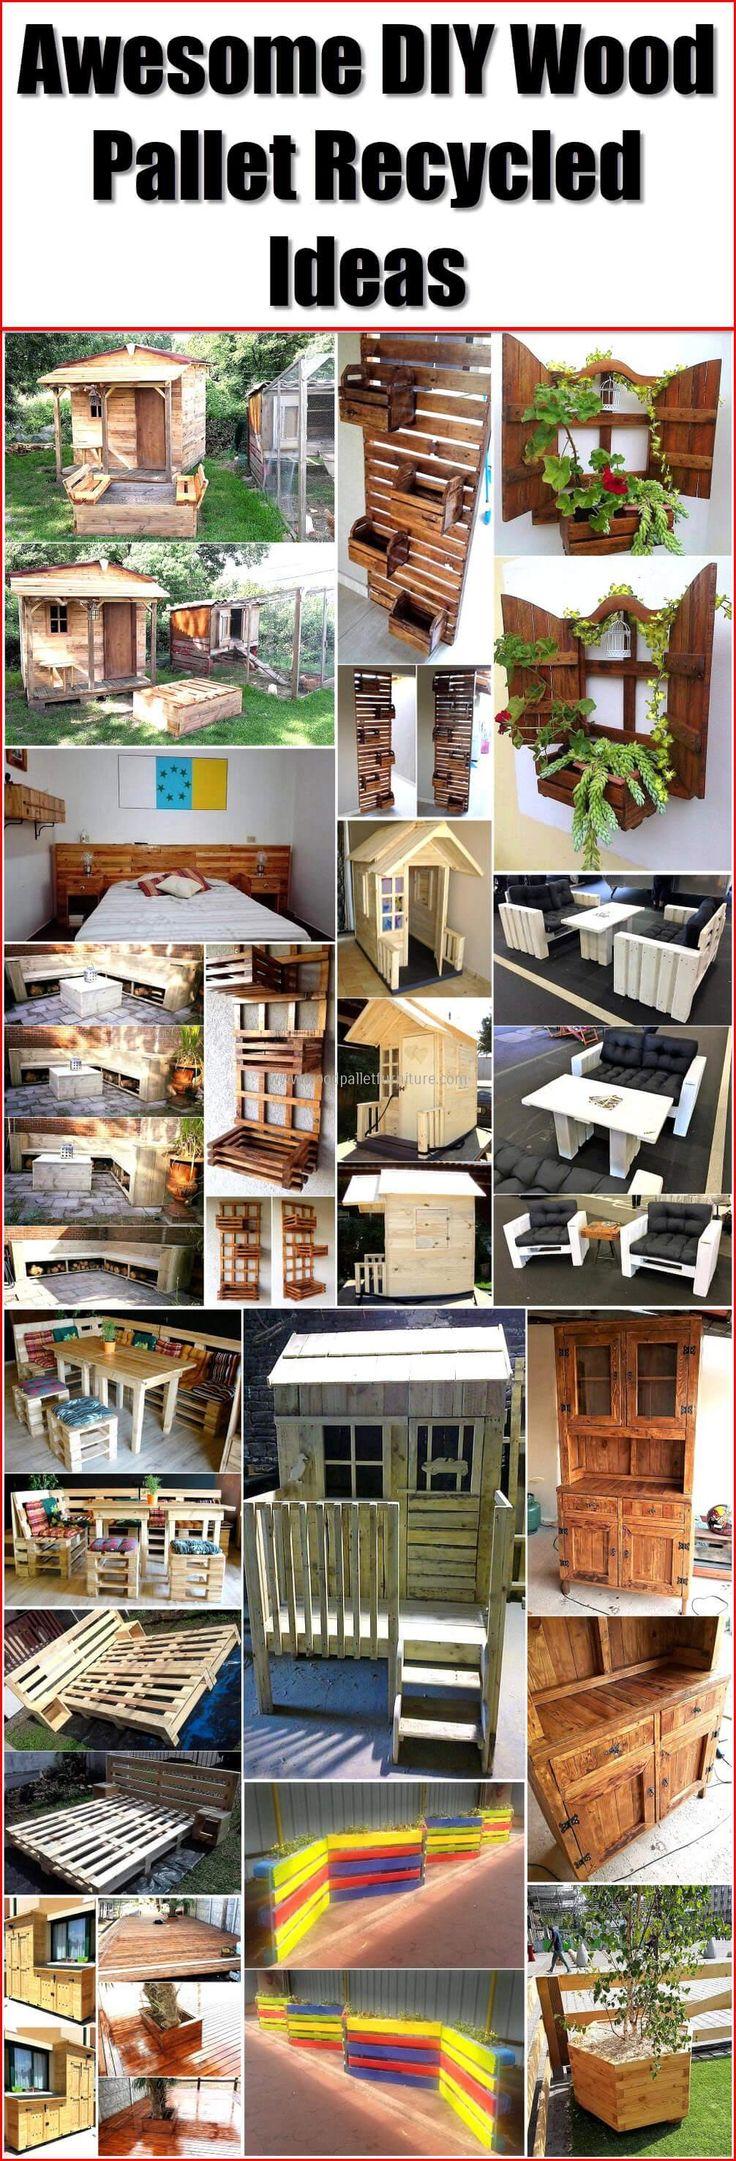 Wooden transport pallets have become increasingly popular for diy - Pallet Wood